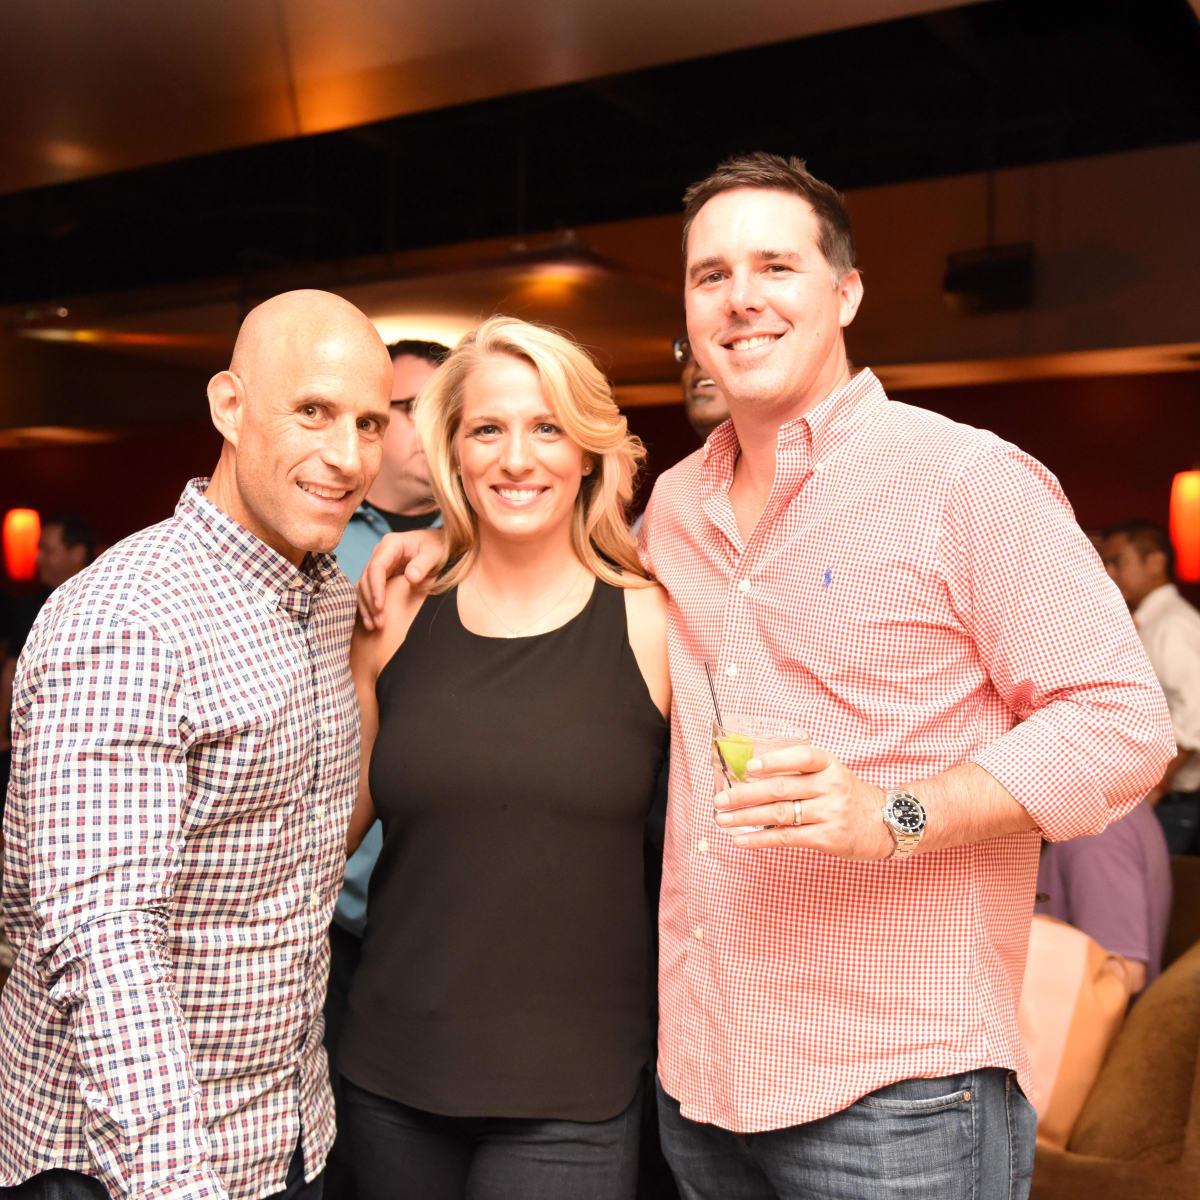 Houston, George Springer All-Star Bowling Benefit, July 2015, Russ Spielman, Dana Fennewald, Rick Rhodes